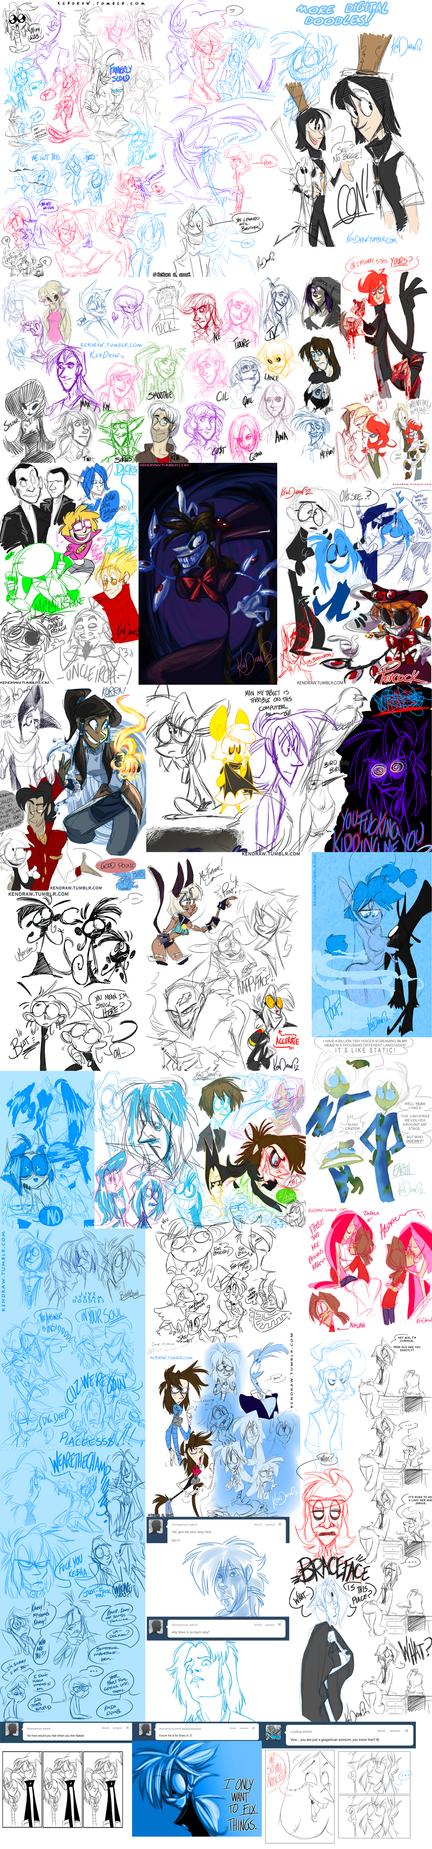 7102012 Digital scribbles by KenDraw